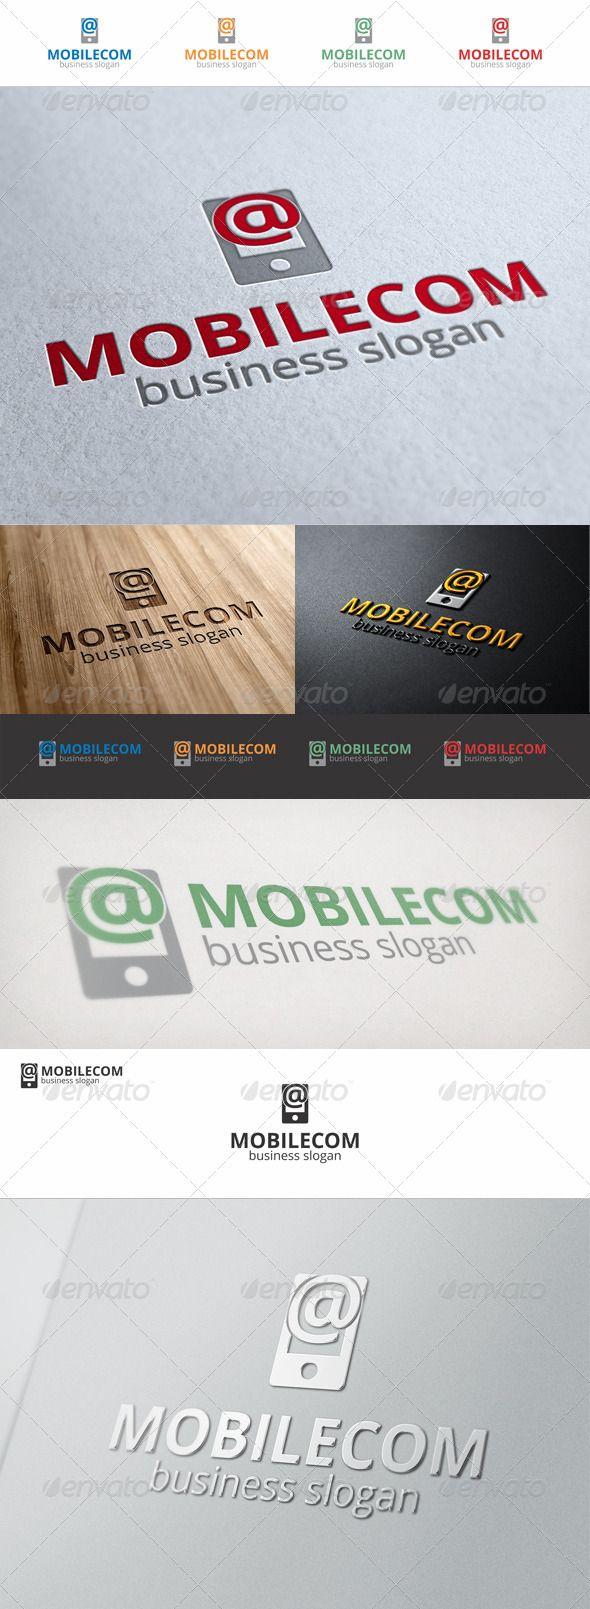 273 best logo computer repair images on pinterest fonts texts mobile com internet logo magicingreecefo Images